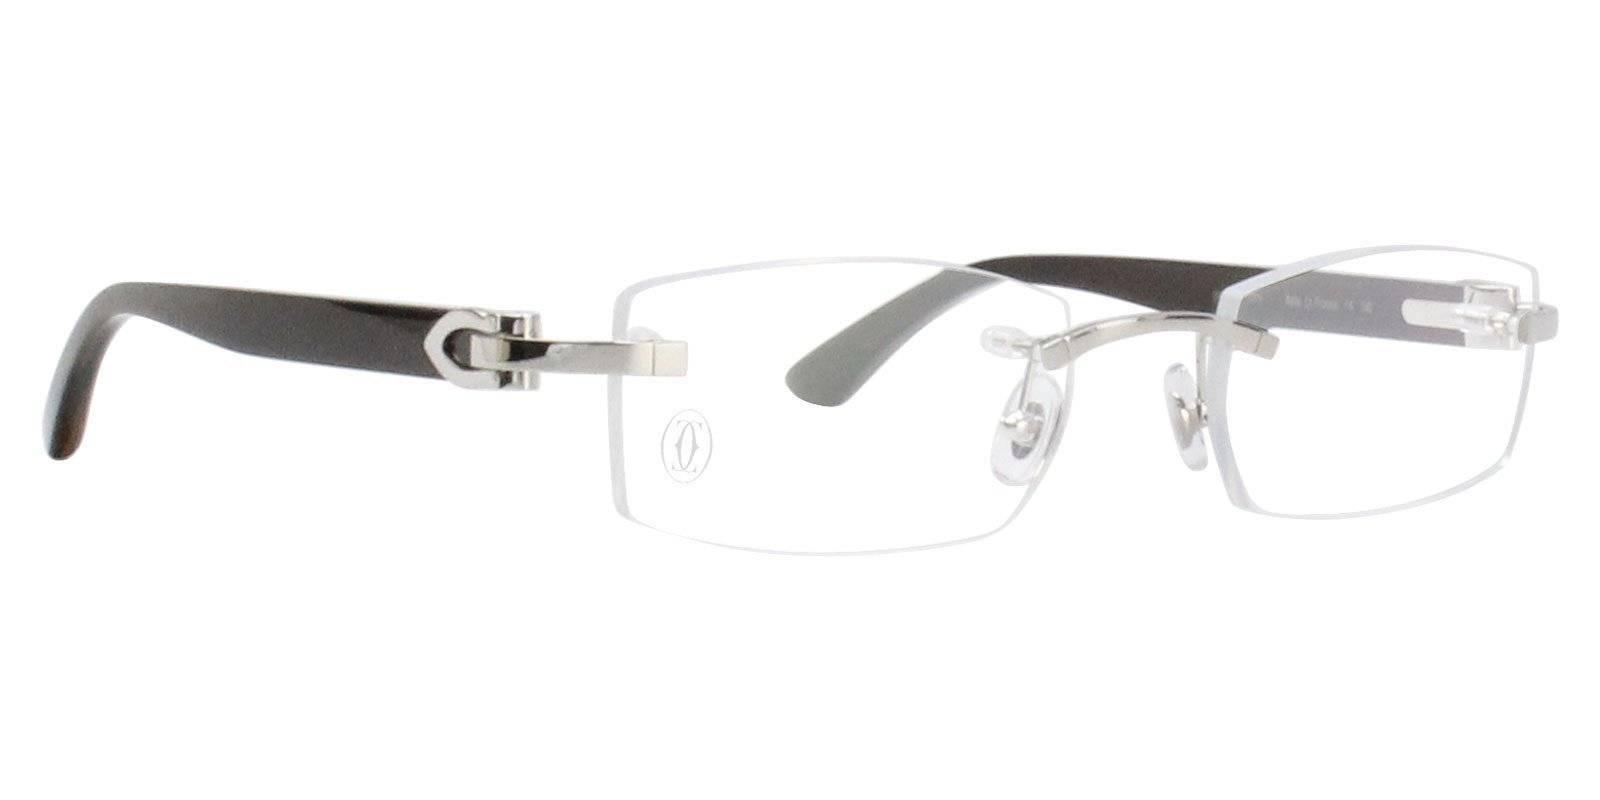 98c5445fa8eb Cartier Horn Eyewear - eyewear near me